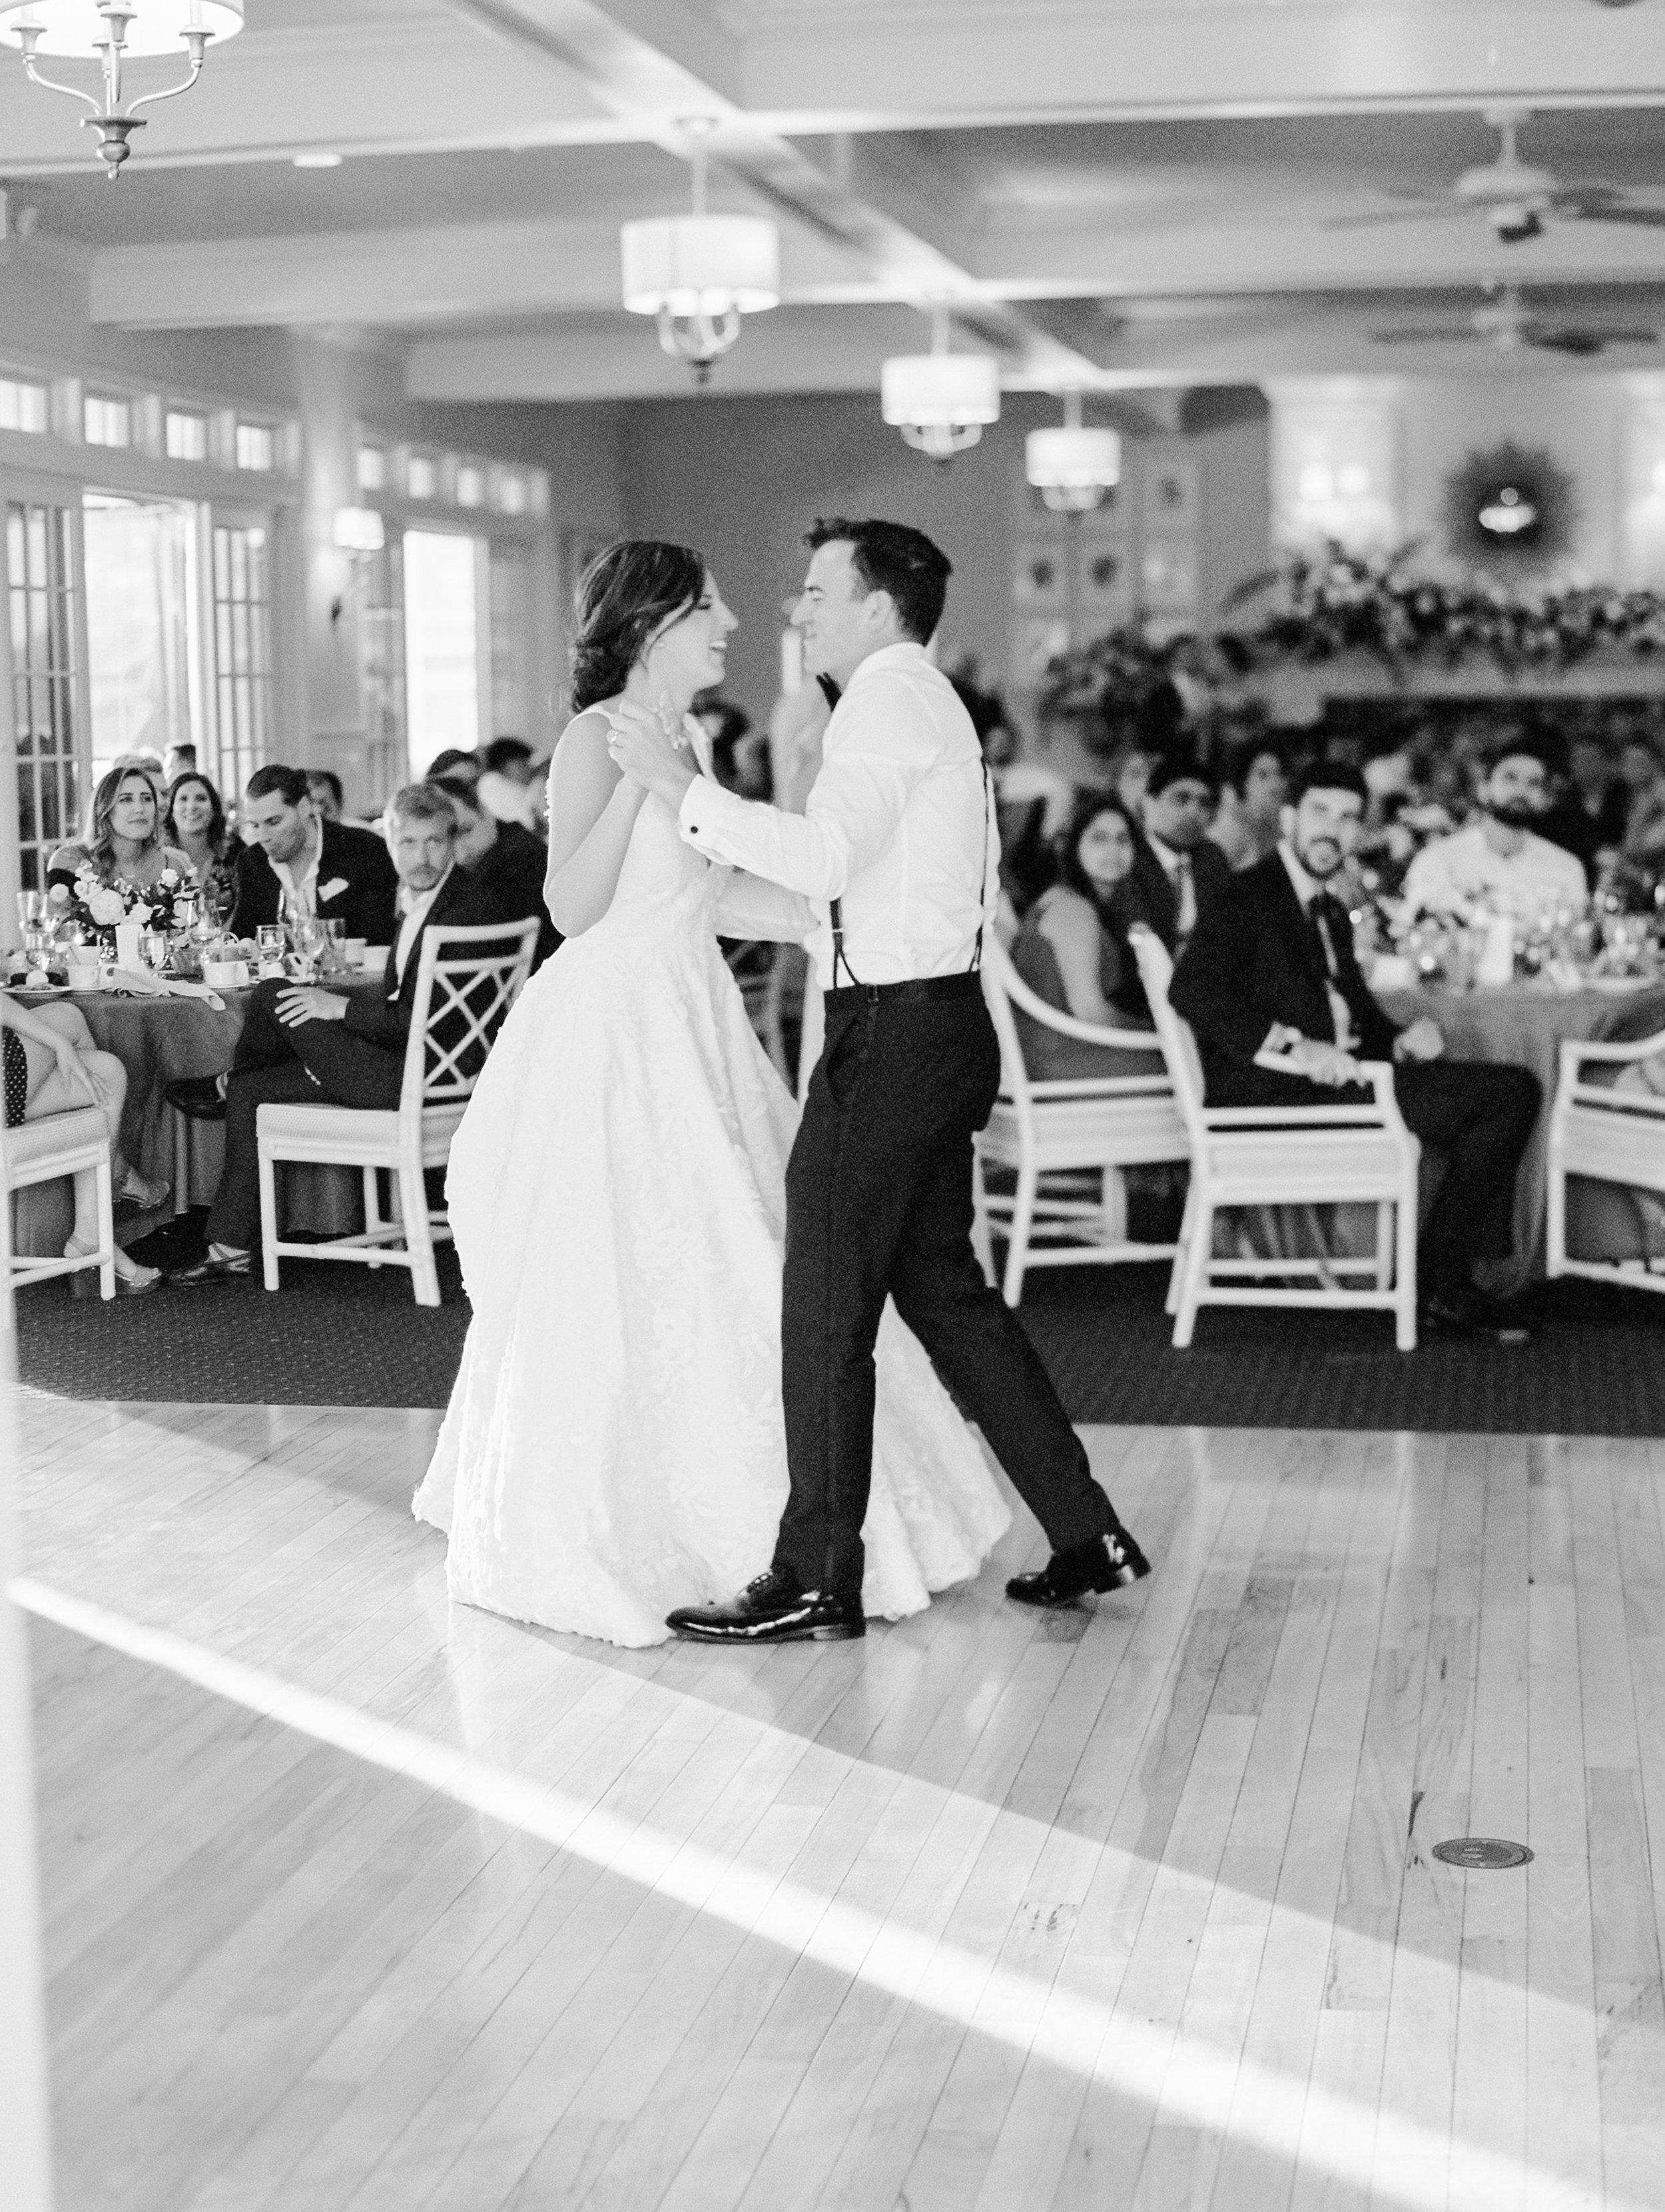 DeGuilio+Wedding+receptionf-12.jpg